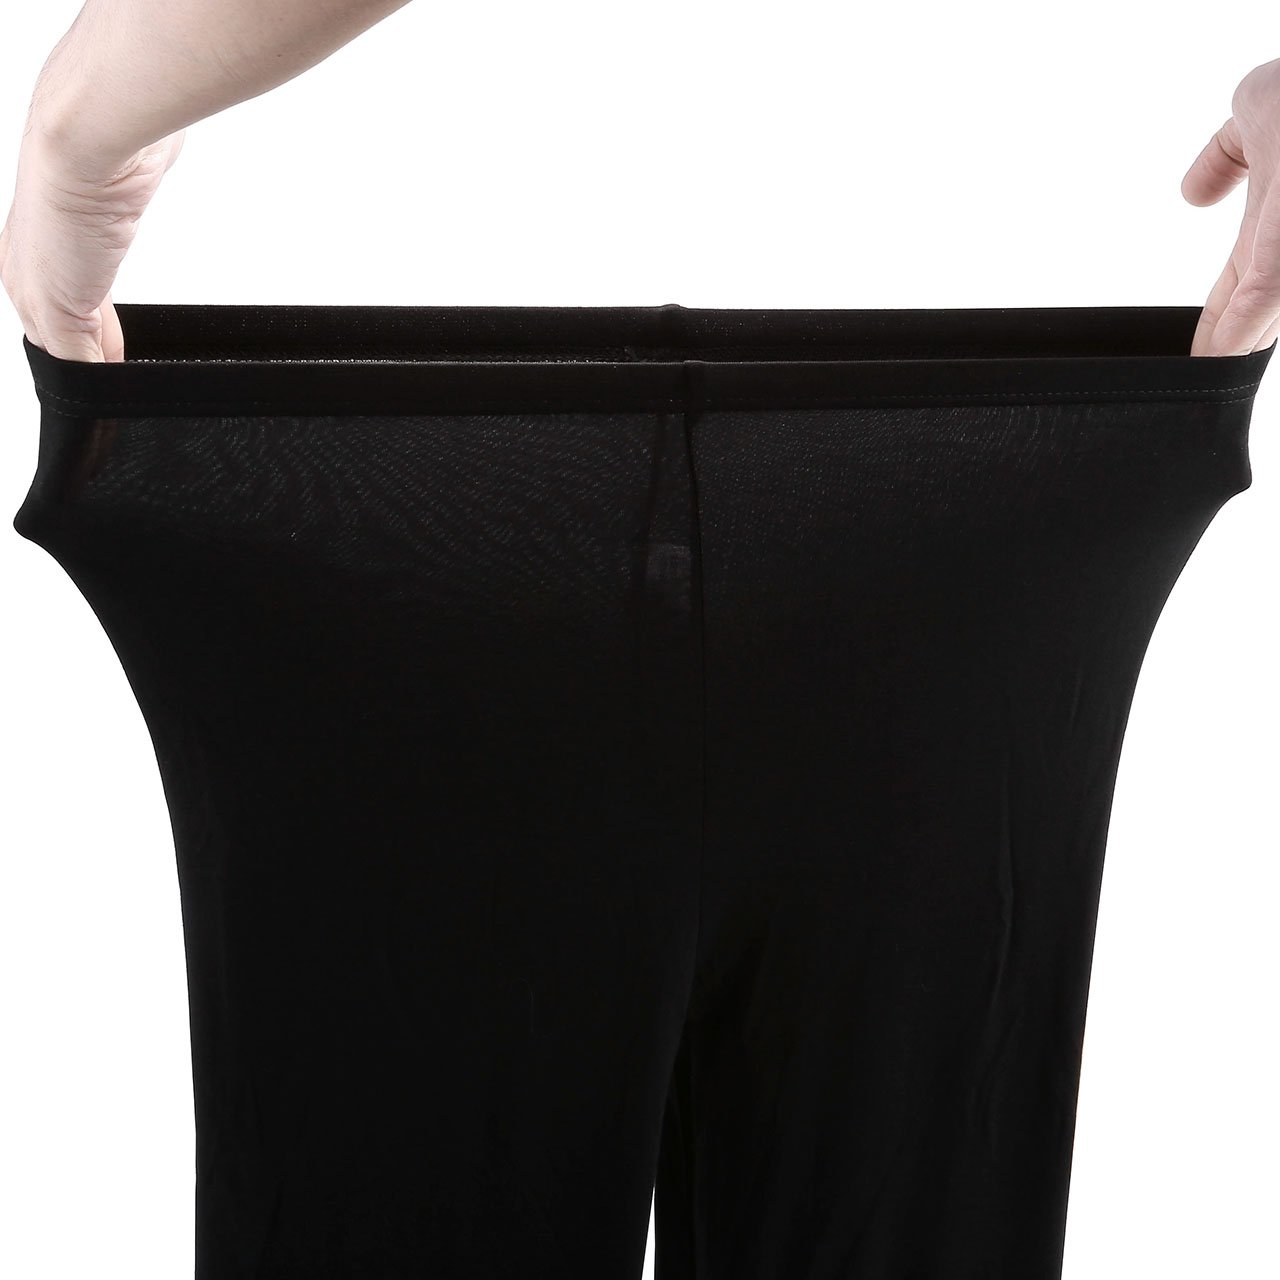 CHIC DIARY 3 Packs Women\'s Elastic Stretchy Yoga Pants Black Grey Navy Yoga Leggings Plus Size (L, Mixed(Black/Dark Grey/Light Grey))